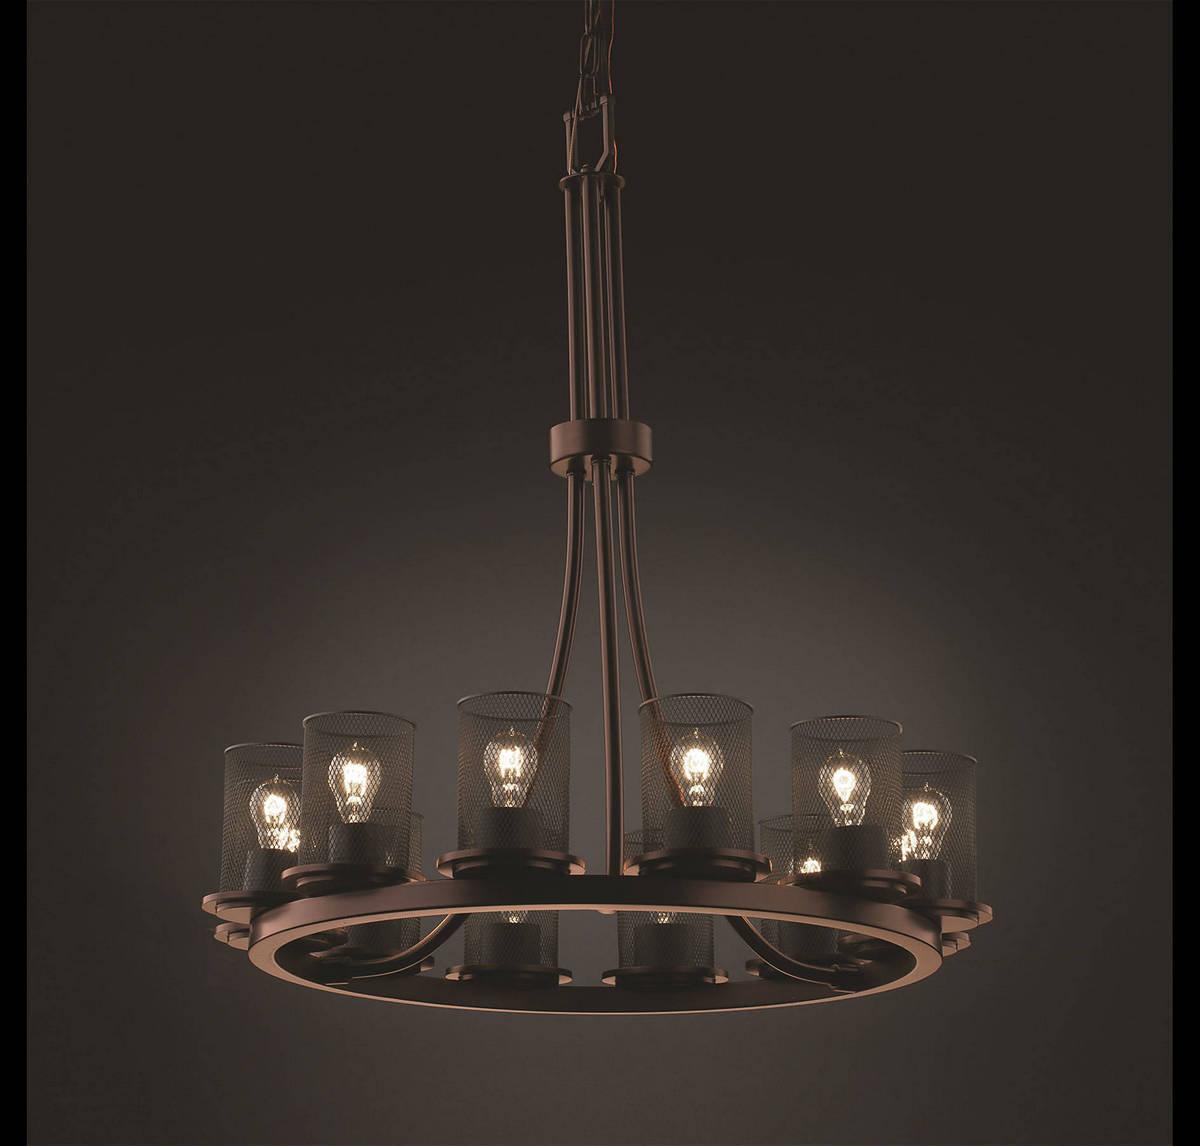 Justice Design Dakota 12-Light Ring Tall Chandelier in Dark Bronze